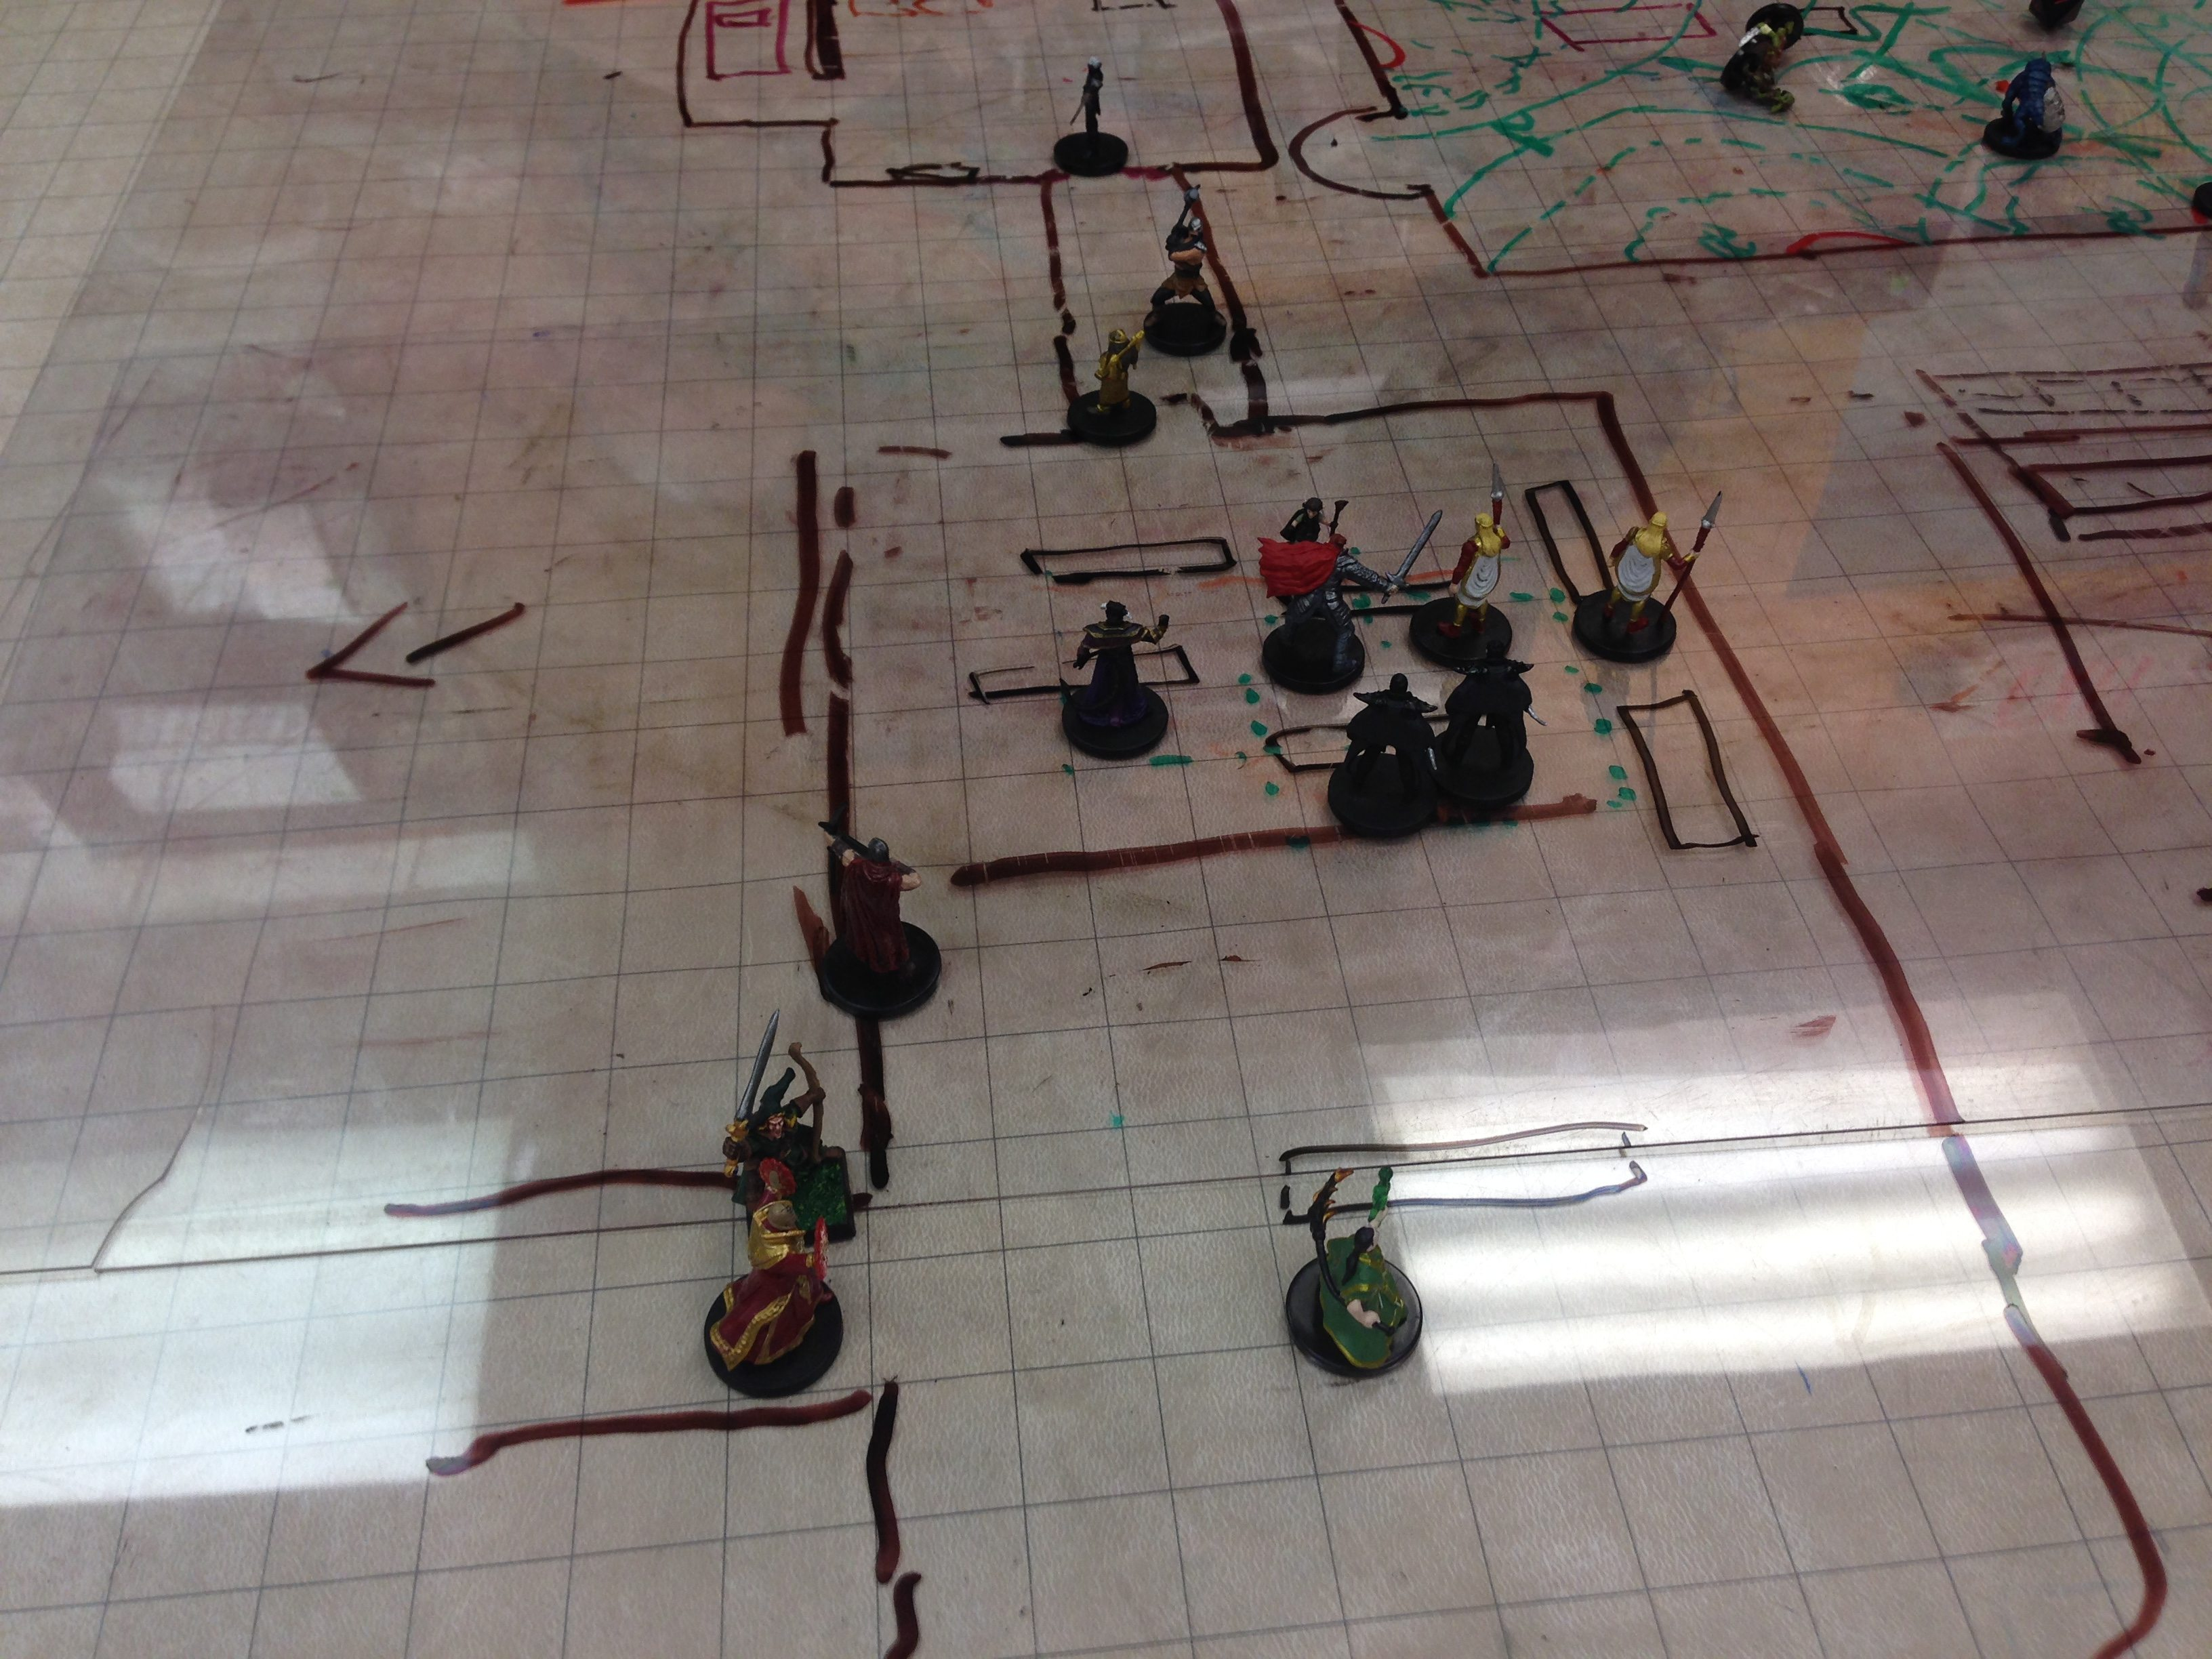 Trouble... lots of it. Six enemies plus the female evil cleric.